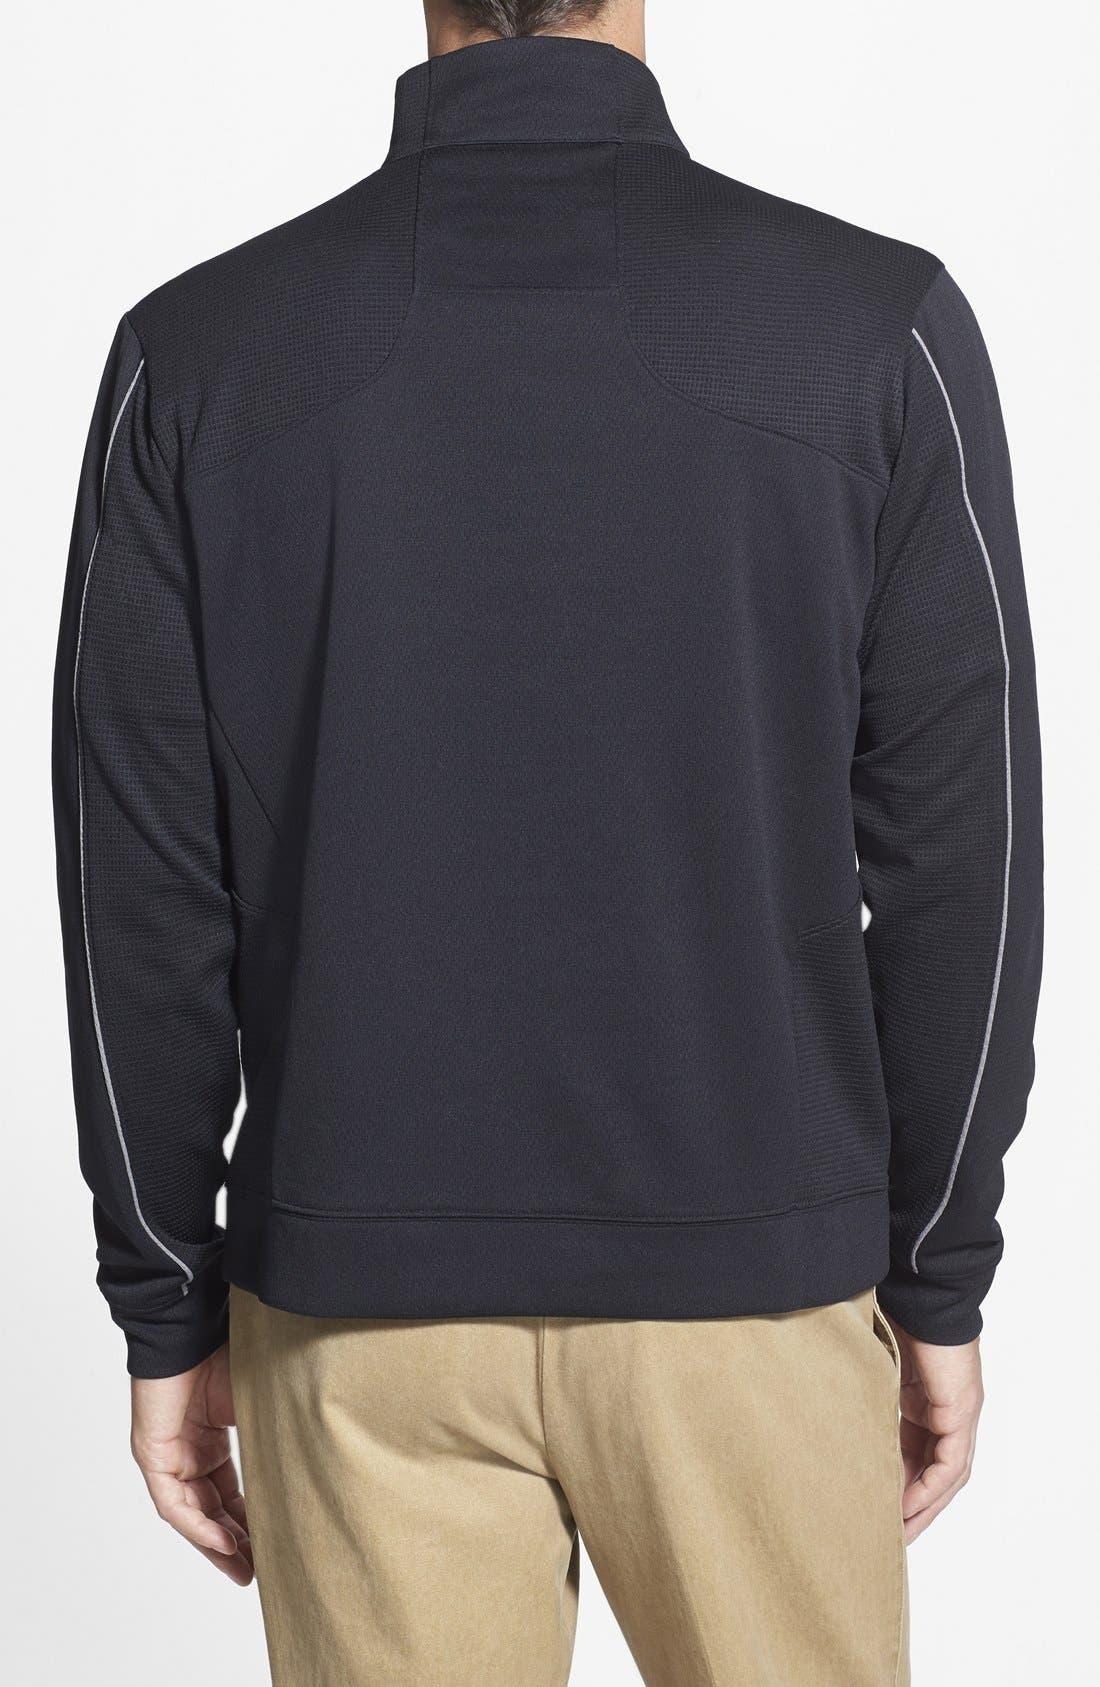 Washington DC NFL Team - Edge DryTec Moisture Wicking Half Zip Pullover,                             Alternate thumbnail 2, color,